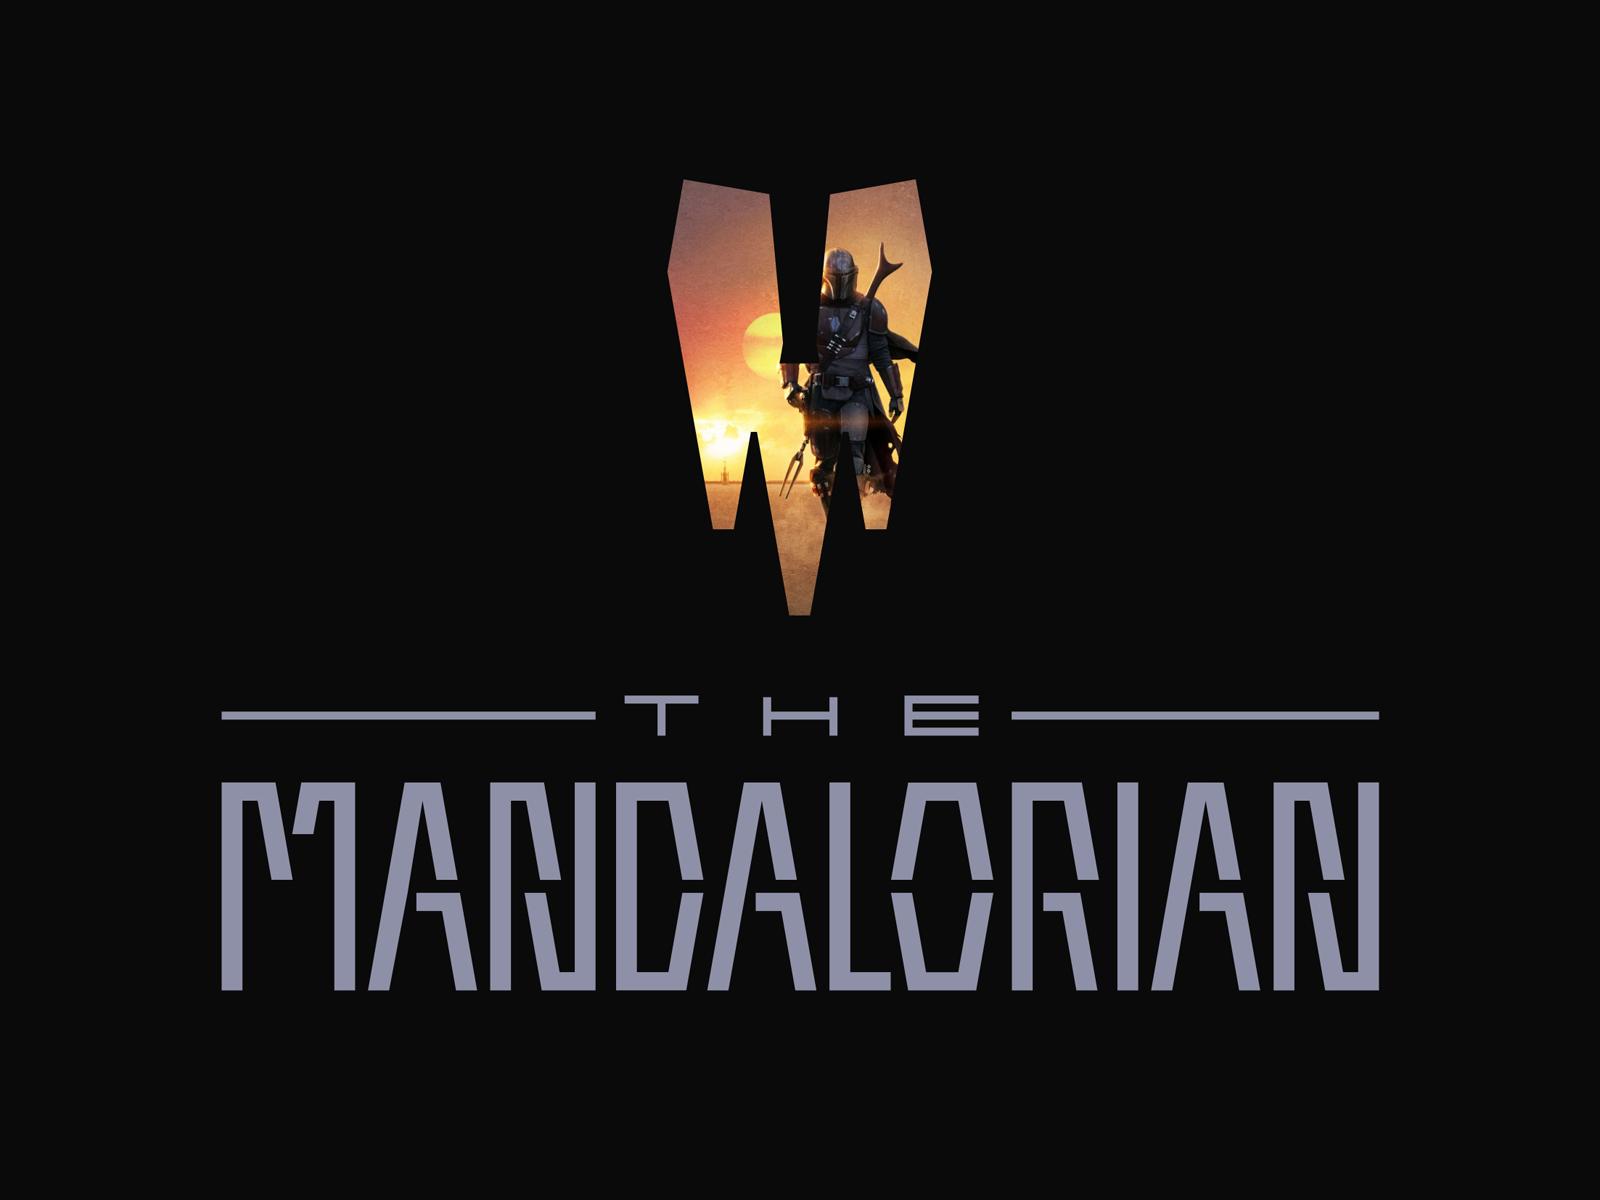 The Mandalorian Logo By Type08 Alen Pavlovic On Dribbble